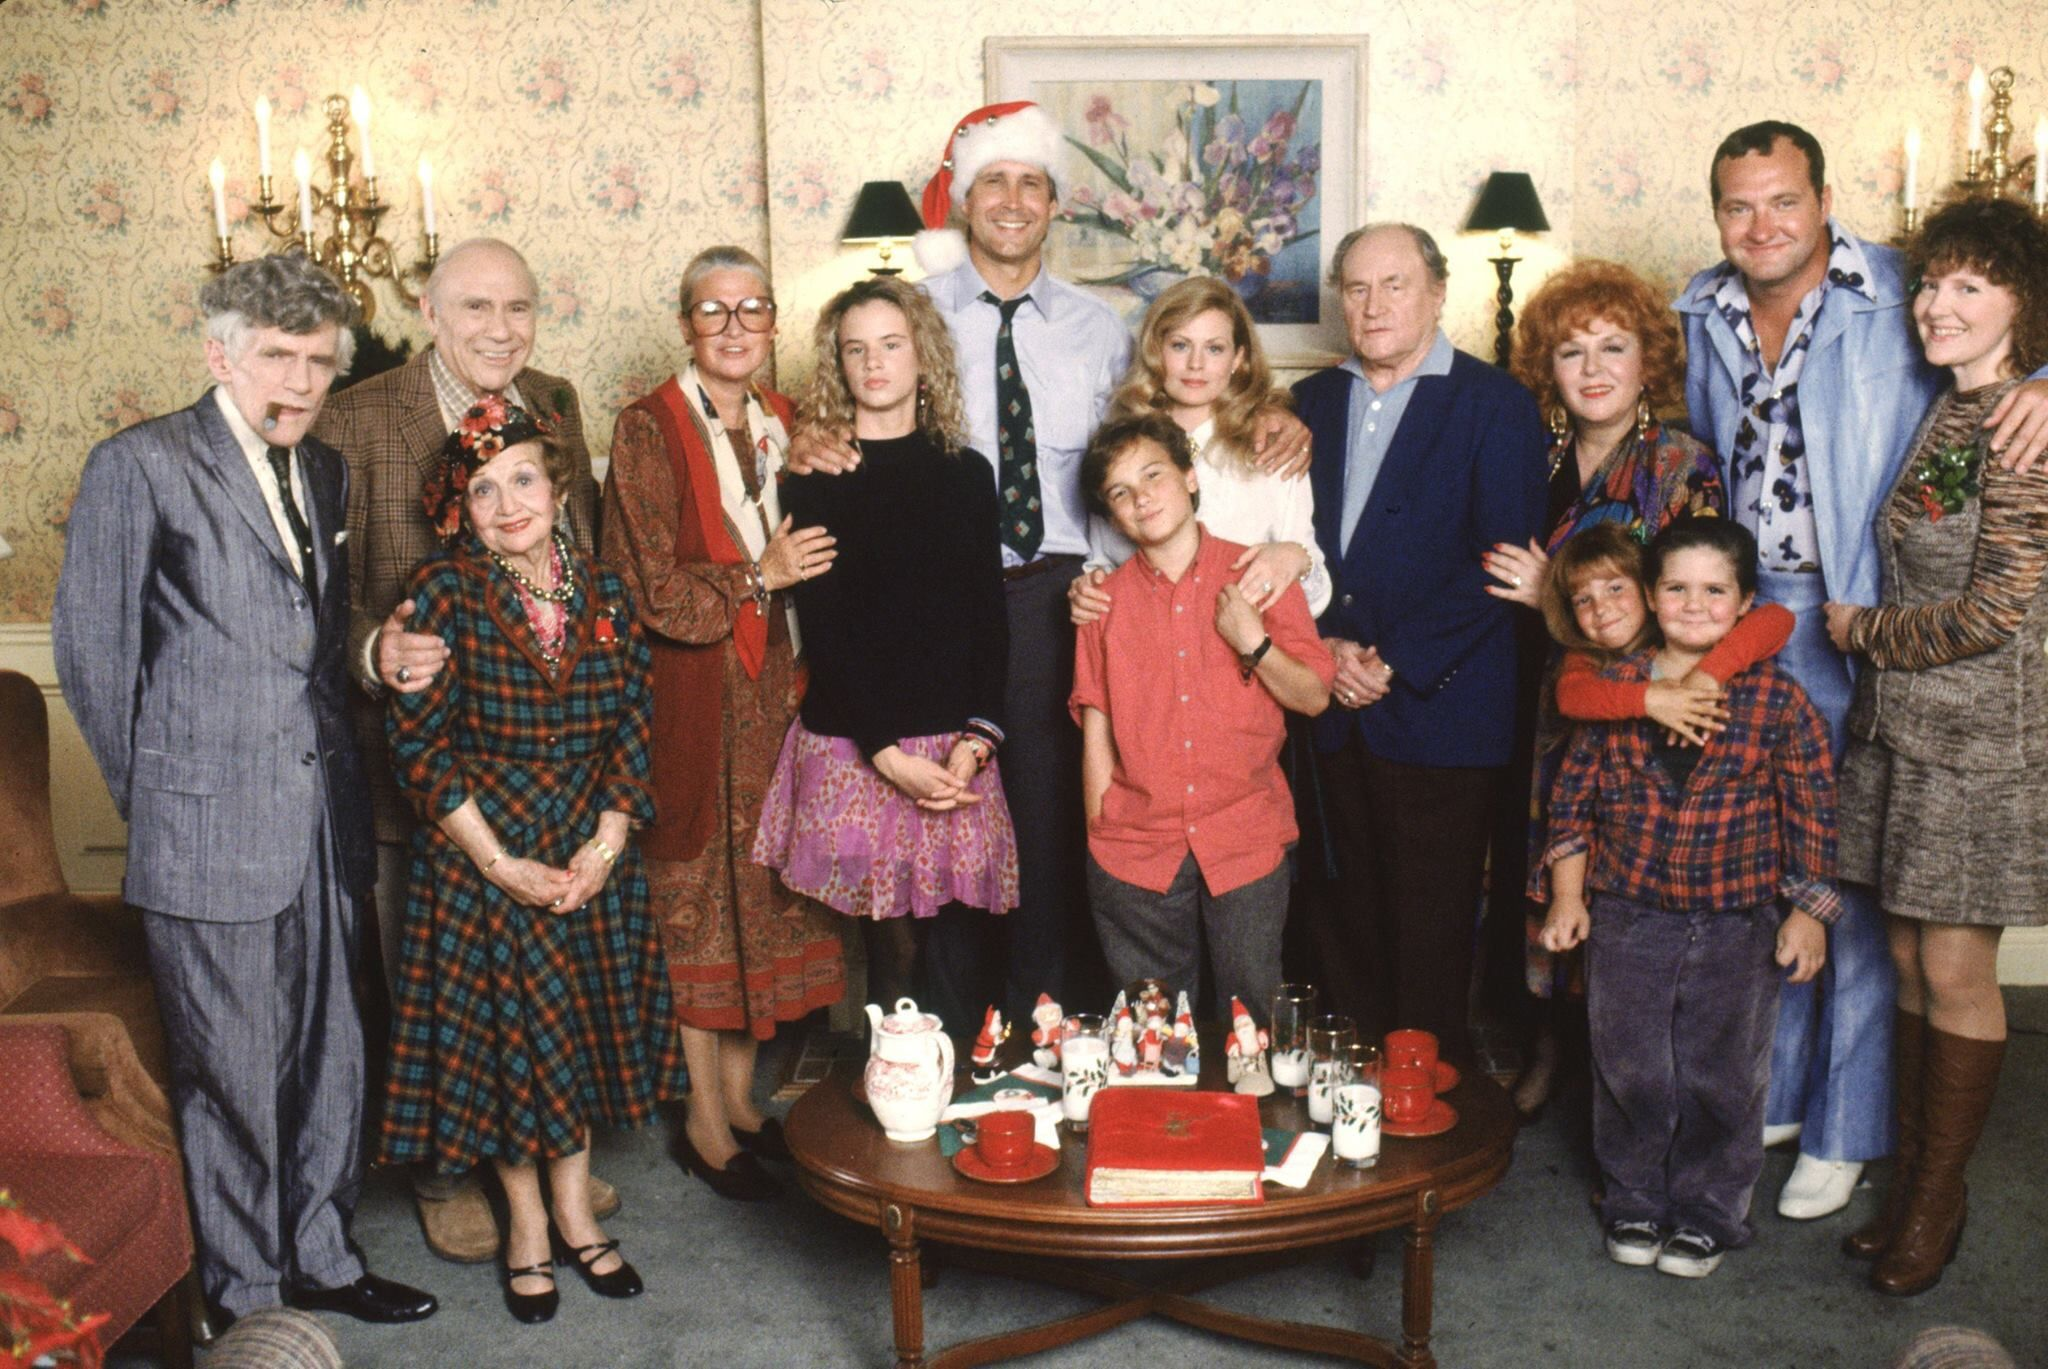 Natl Lampoons Cast Christmas vacation movie, Christmas